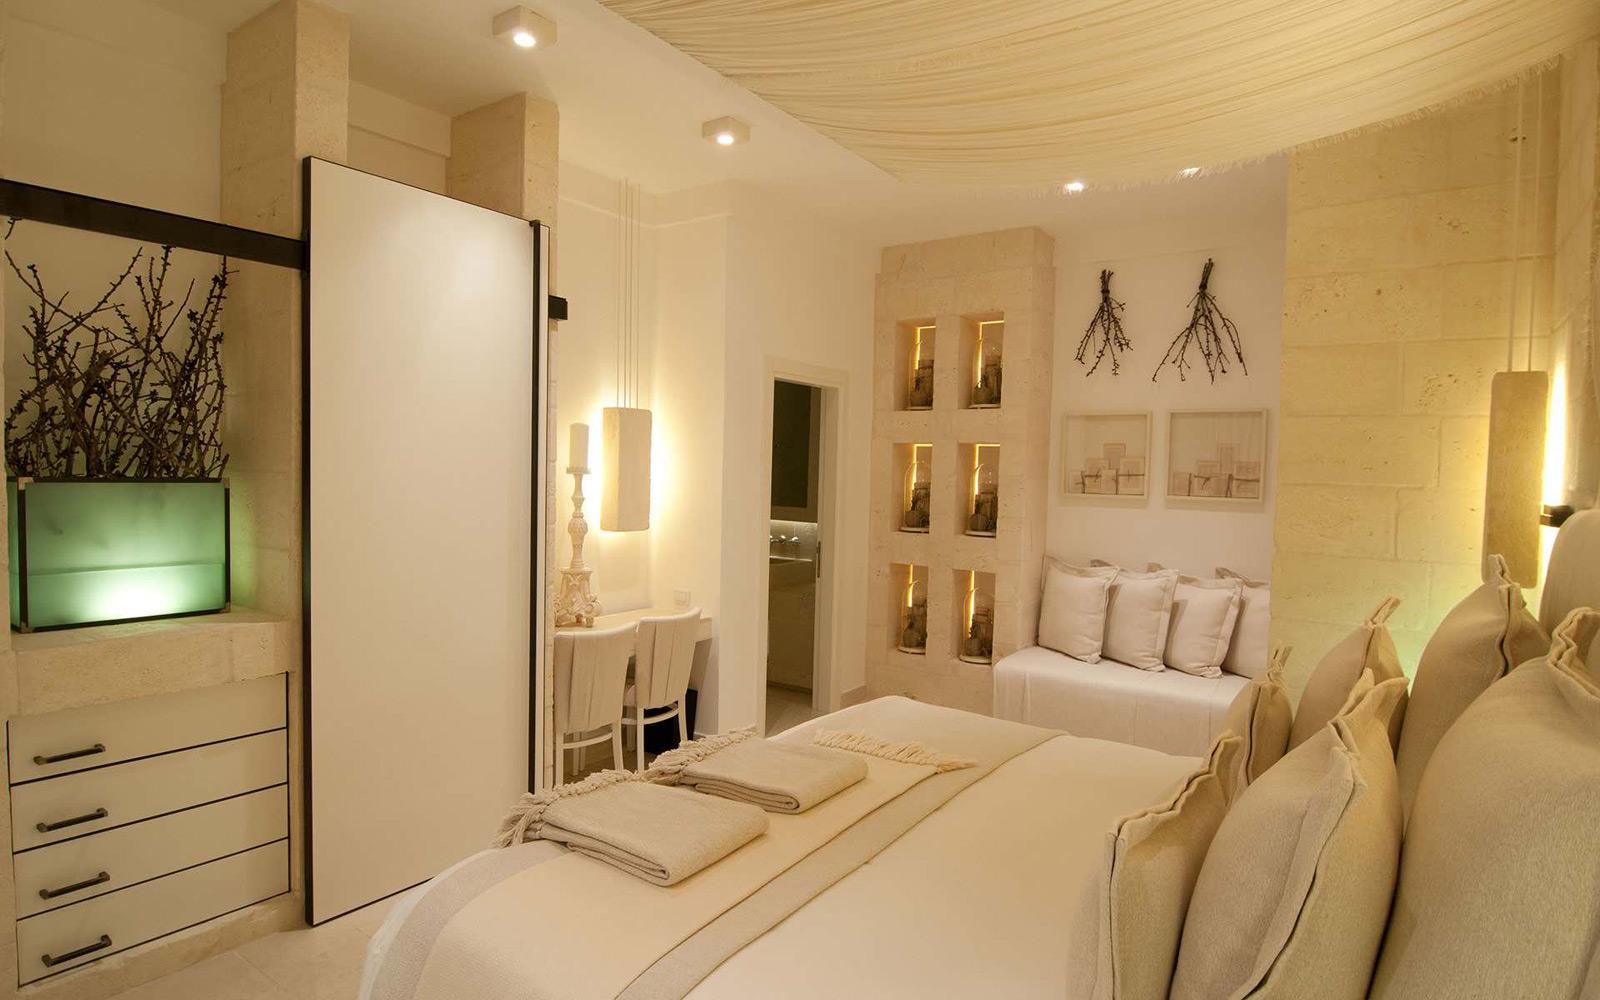 Corte Magnifica - Bedroom